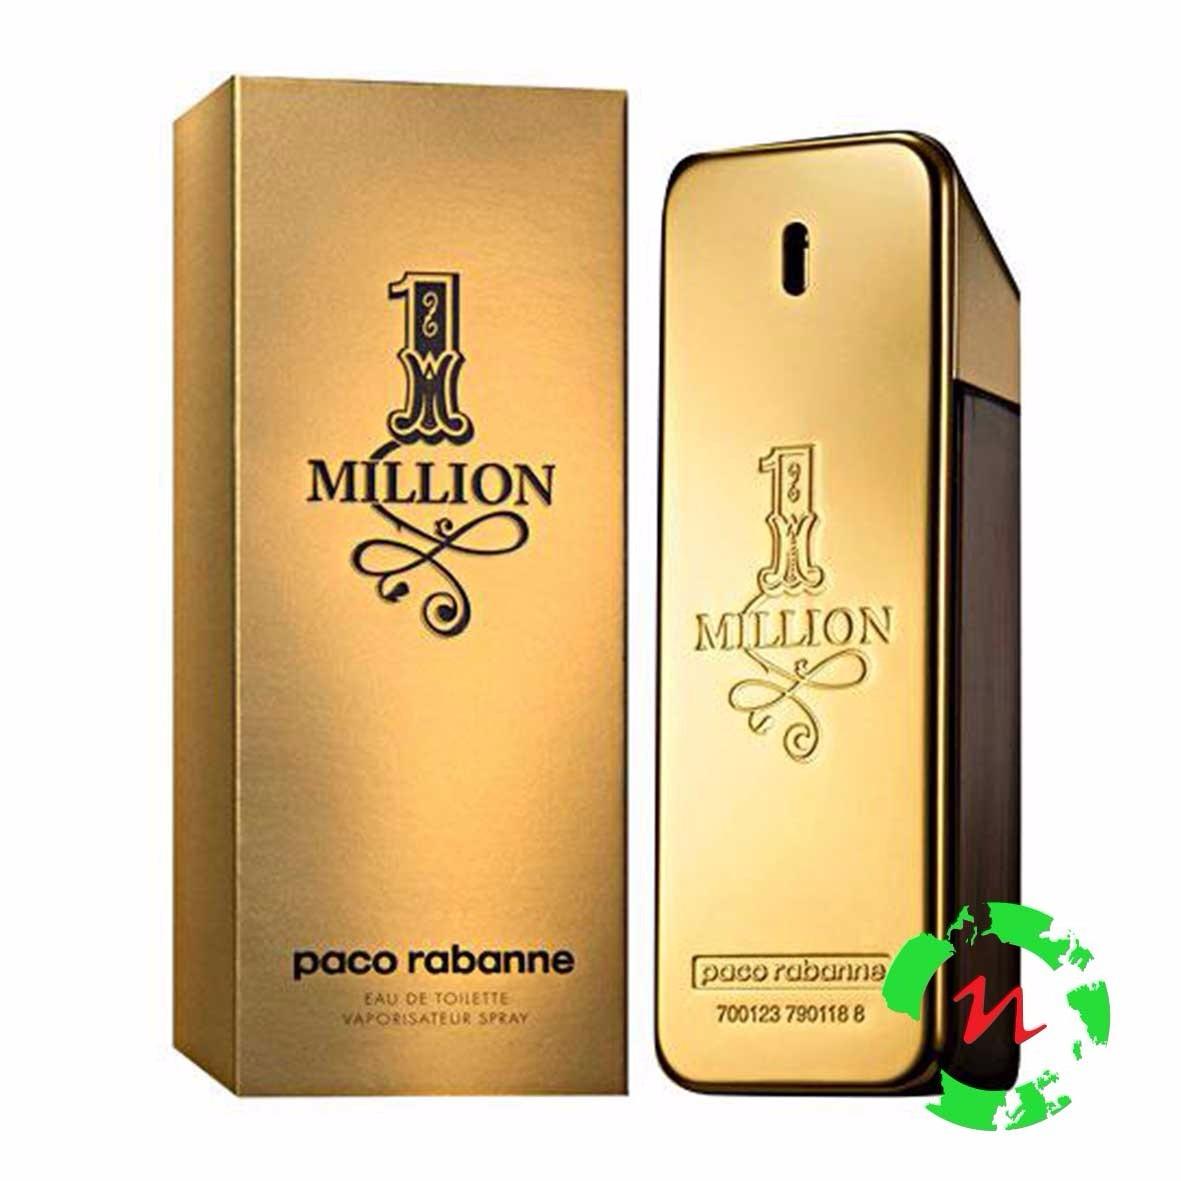 perfume one million 200ml r 359 00 em mercado livre. Black Bedroom Furniture Sets. Home Design Ideas